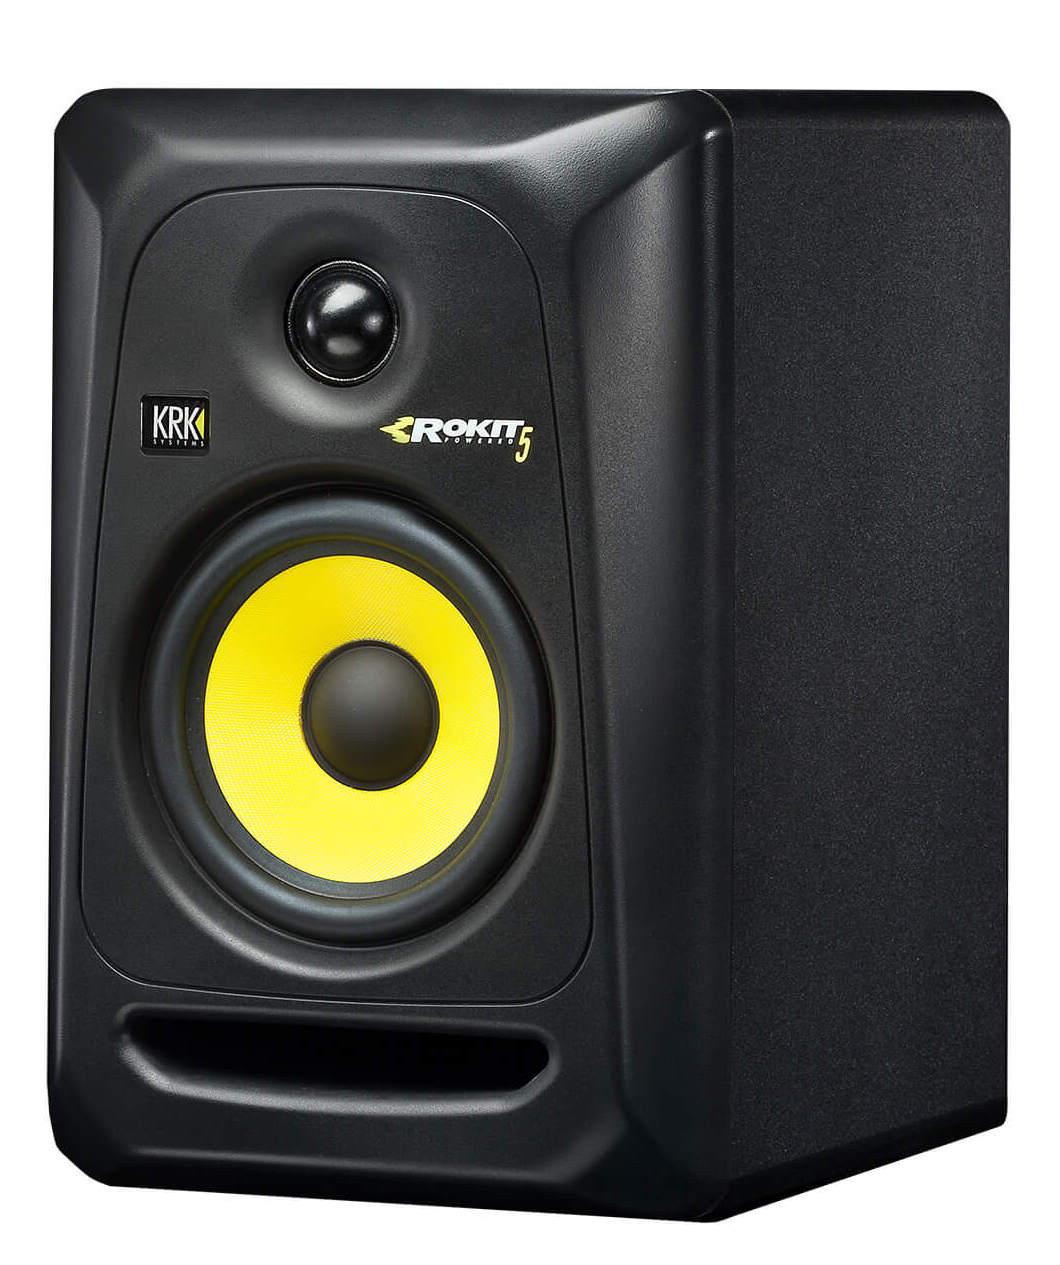 Krk Classic 5 Rokit Monitor de Áudio Bi-amplificado Krk Classic 5 50W de Potencia